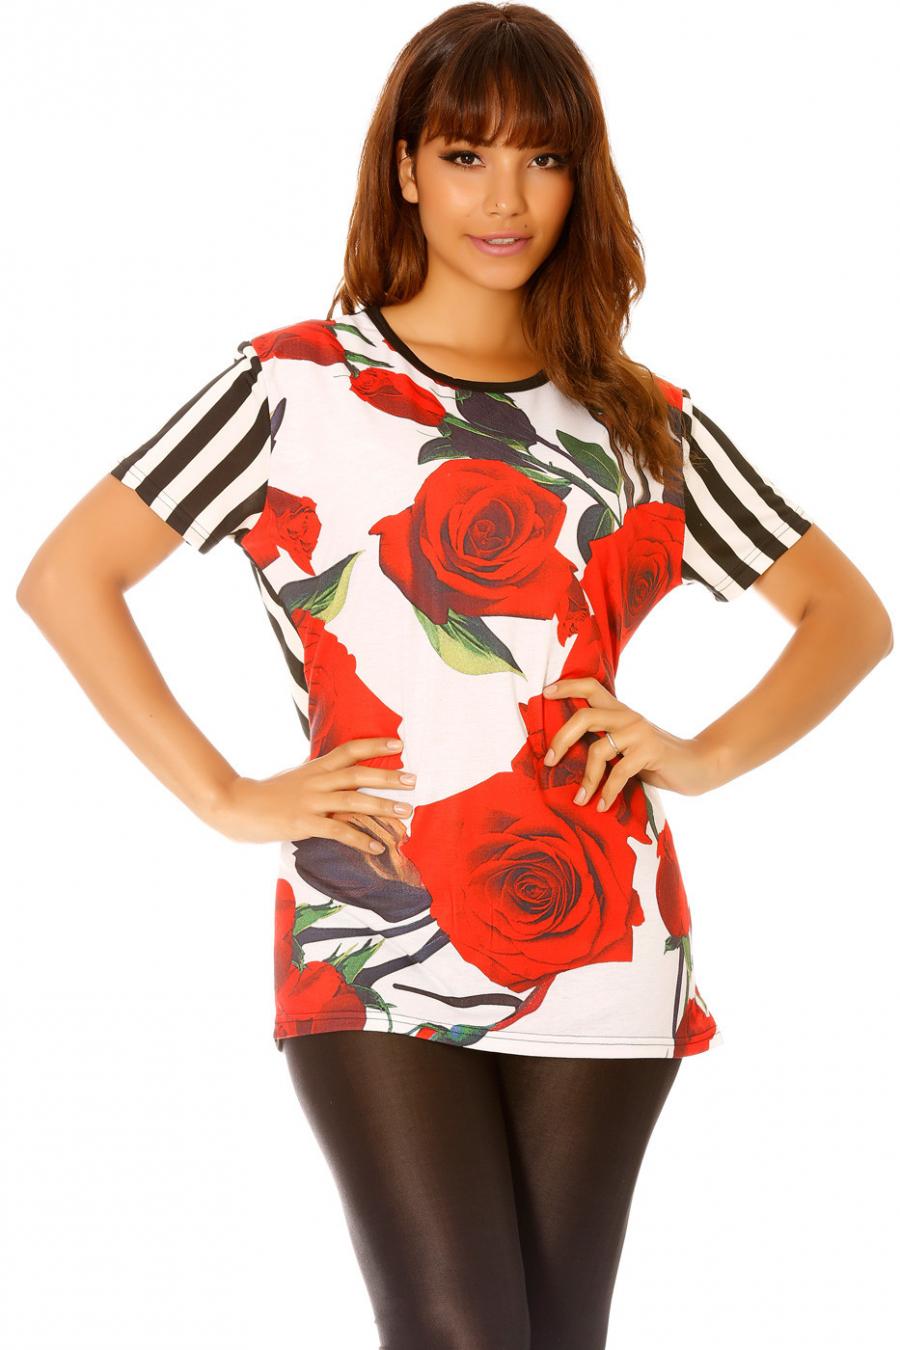 Tee-shirt rayé noir avec fleurs. MC1665